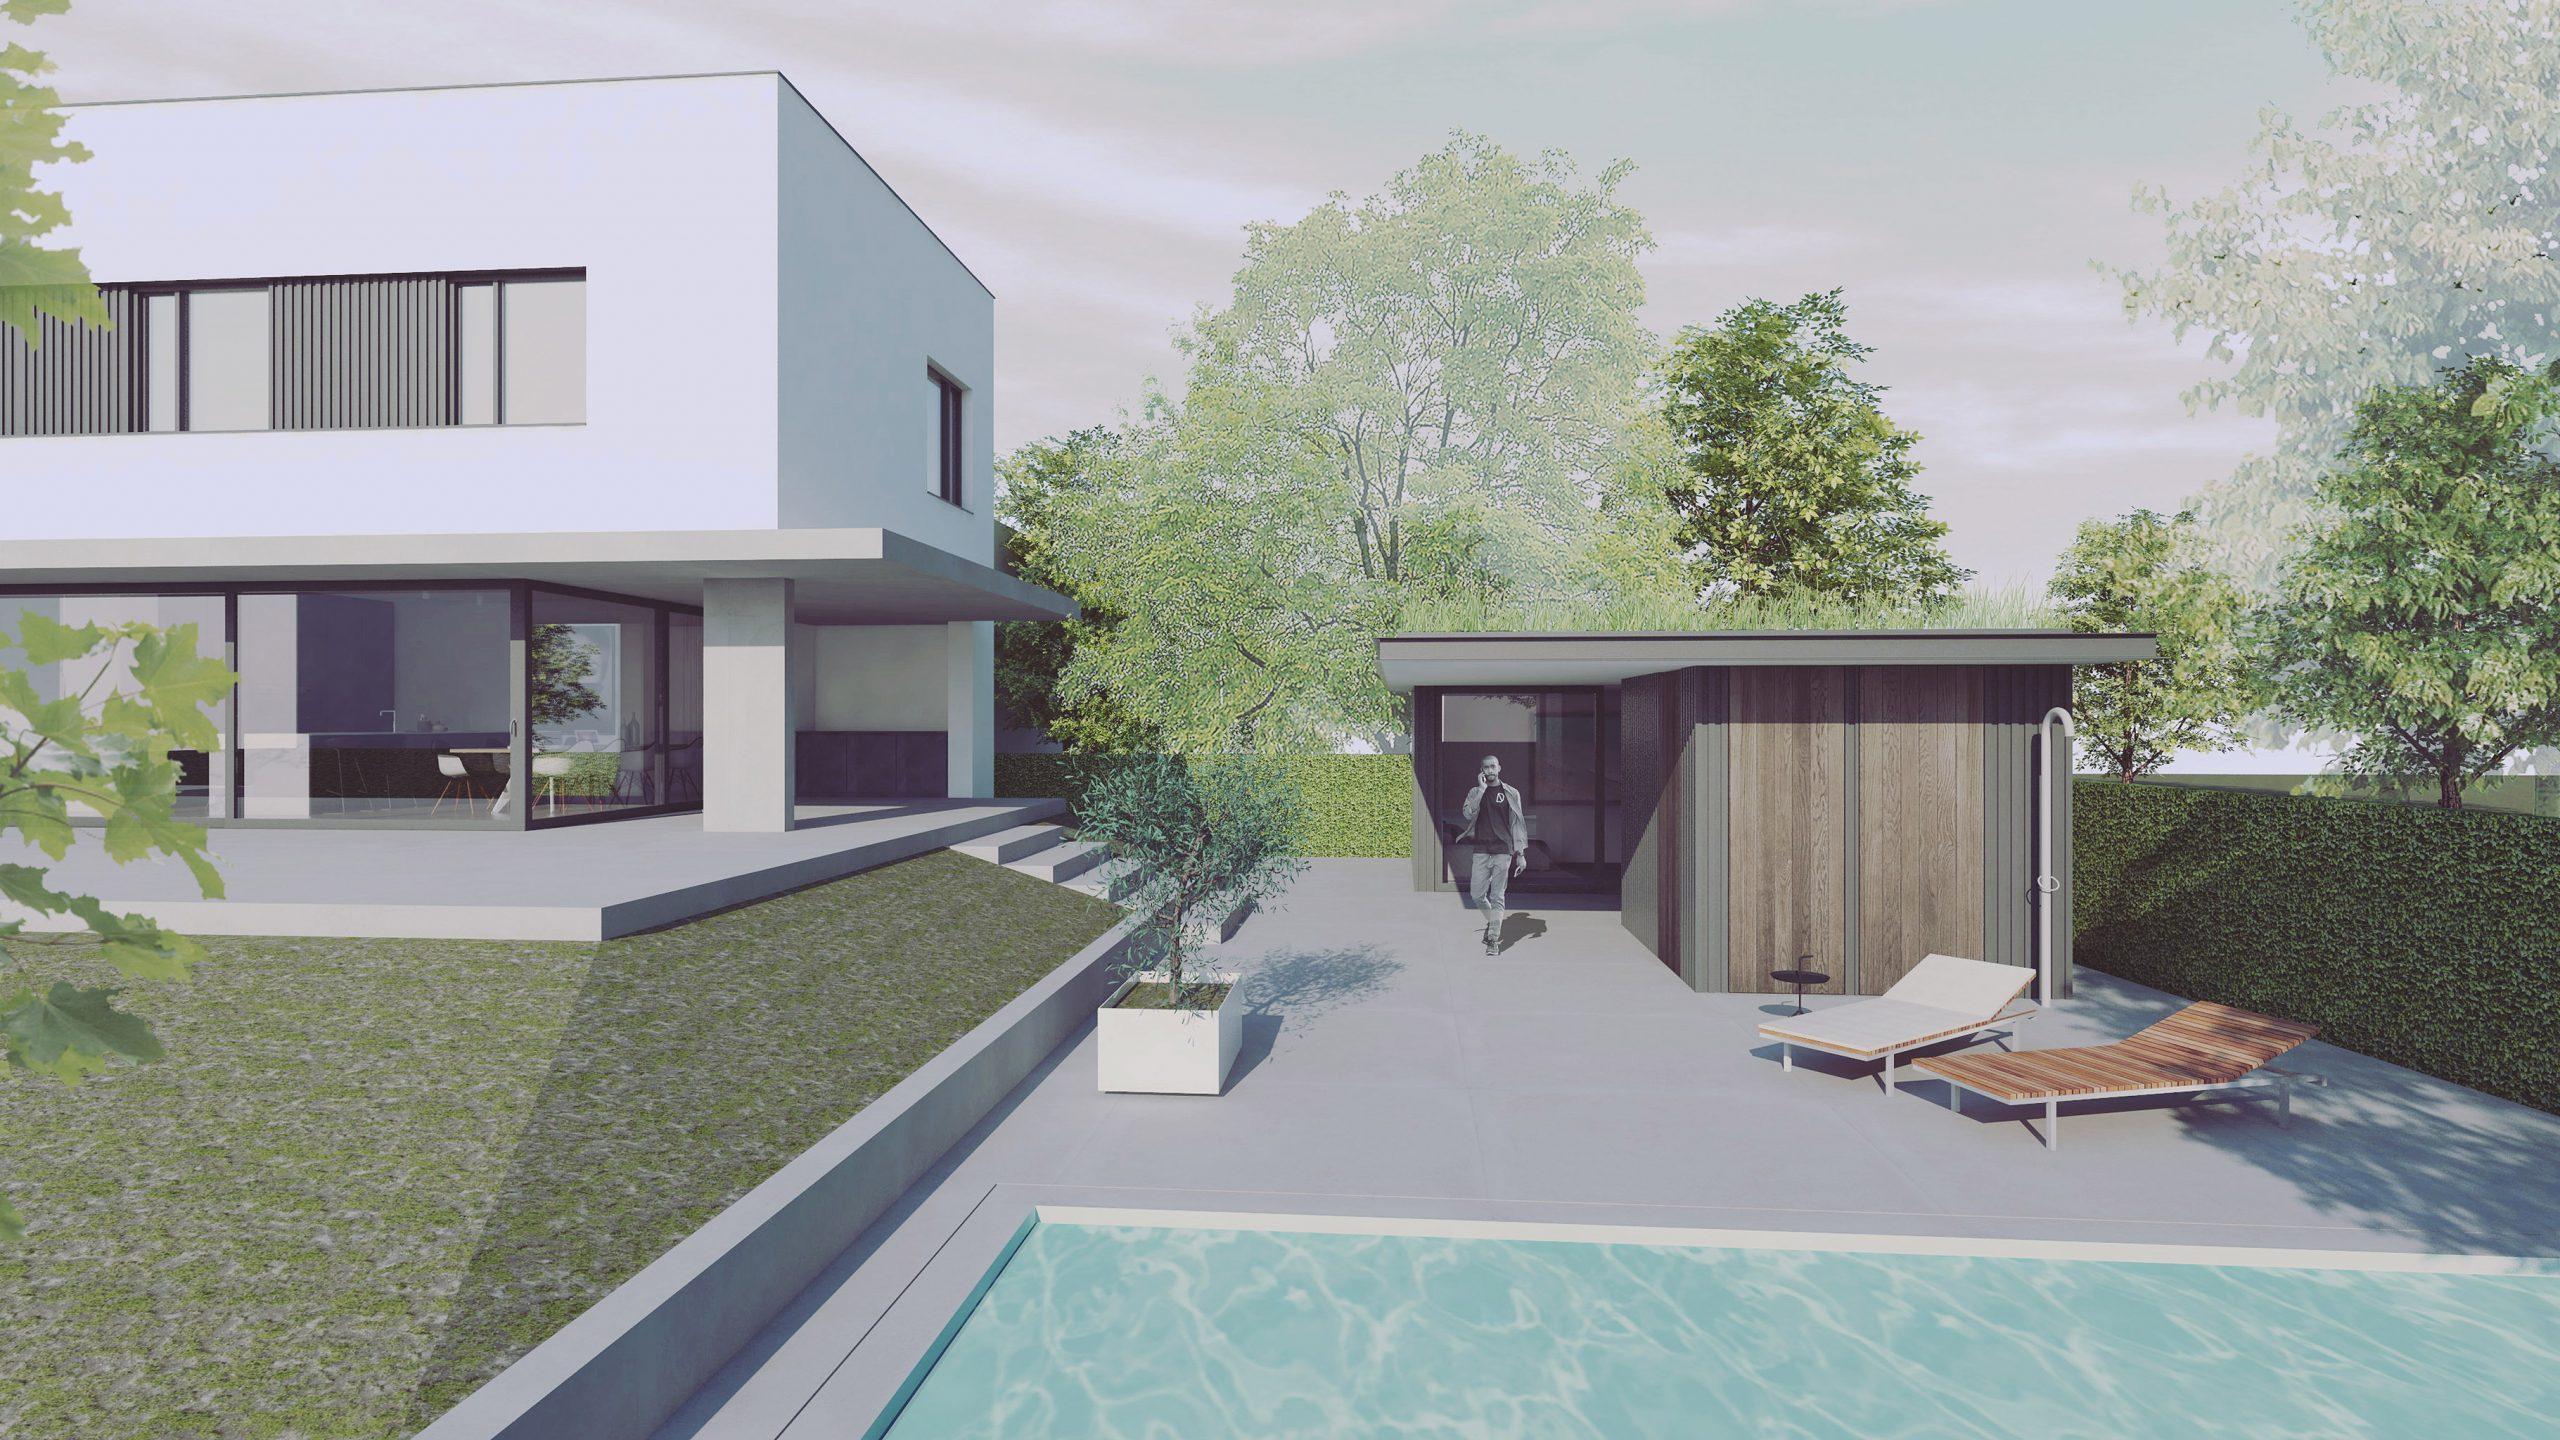 exterieur poolhouse nieuwbouw villa nieuw stalberg venlo